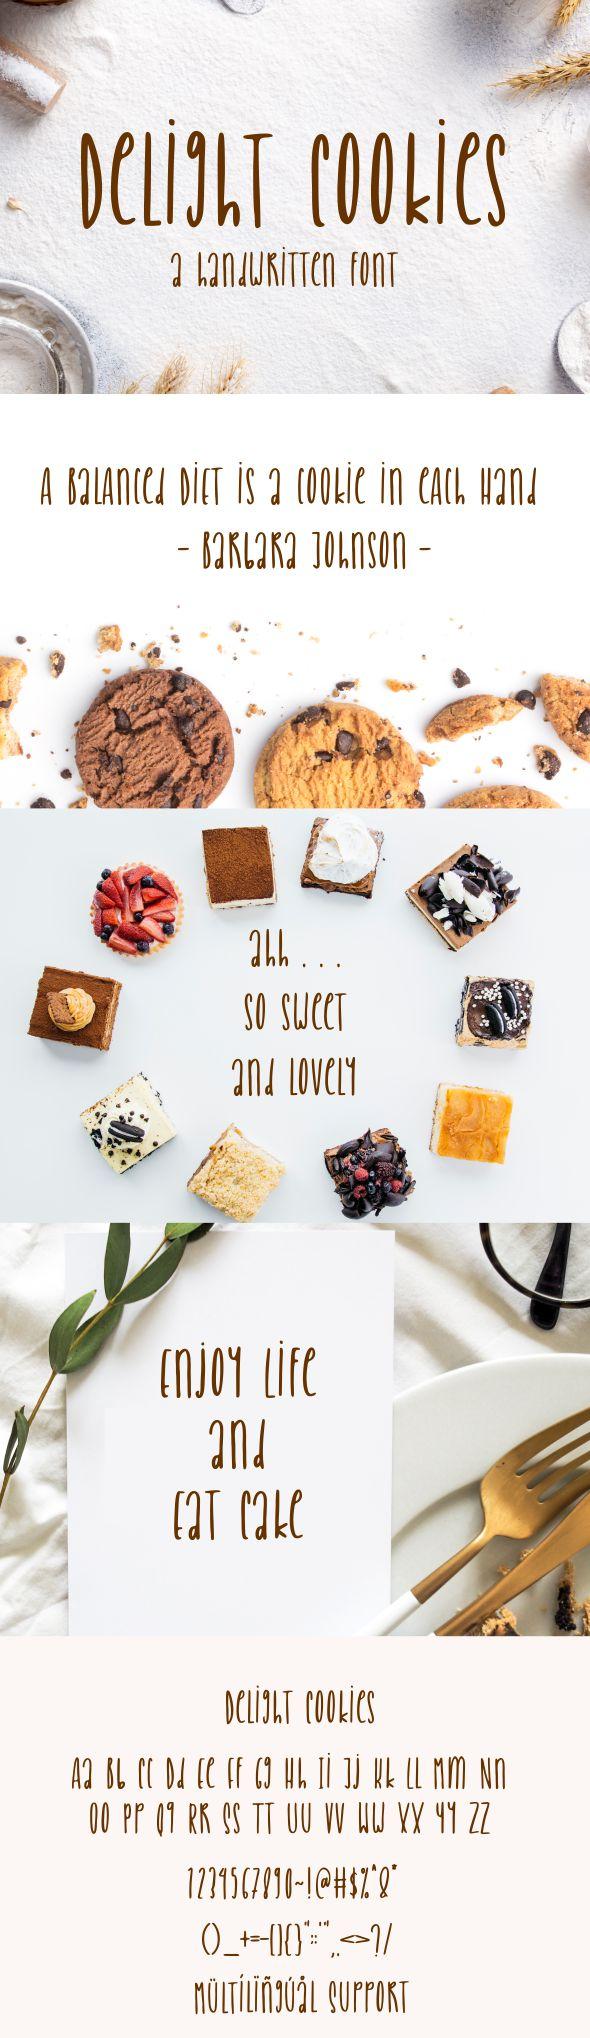 Delight Cookies - A Handwritten Font